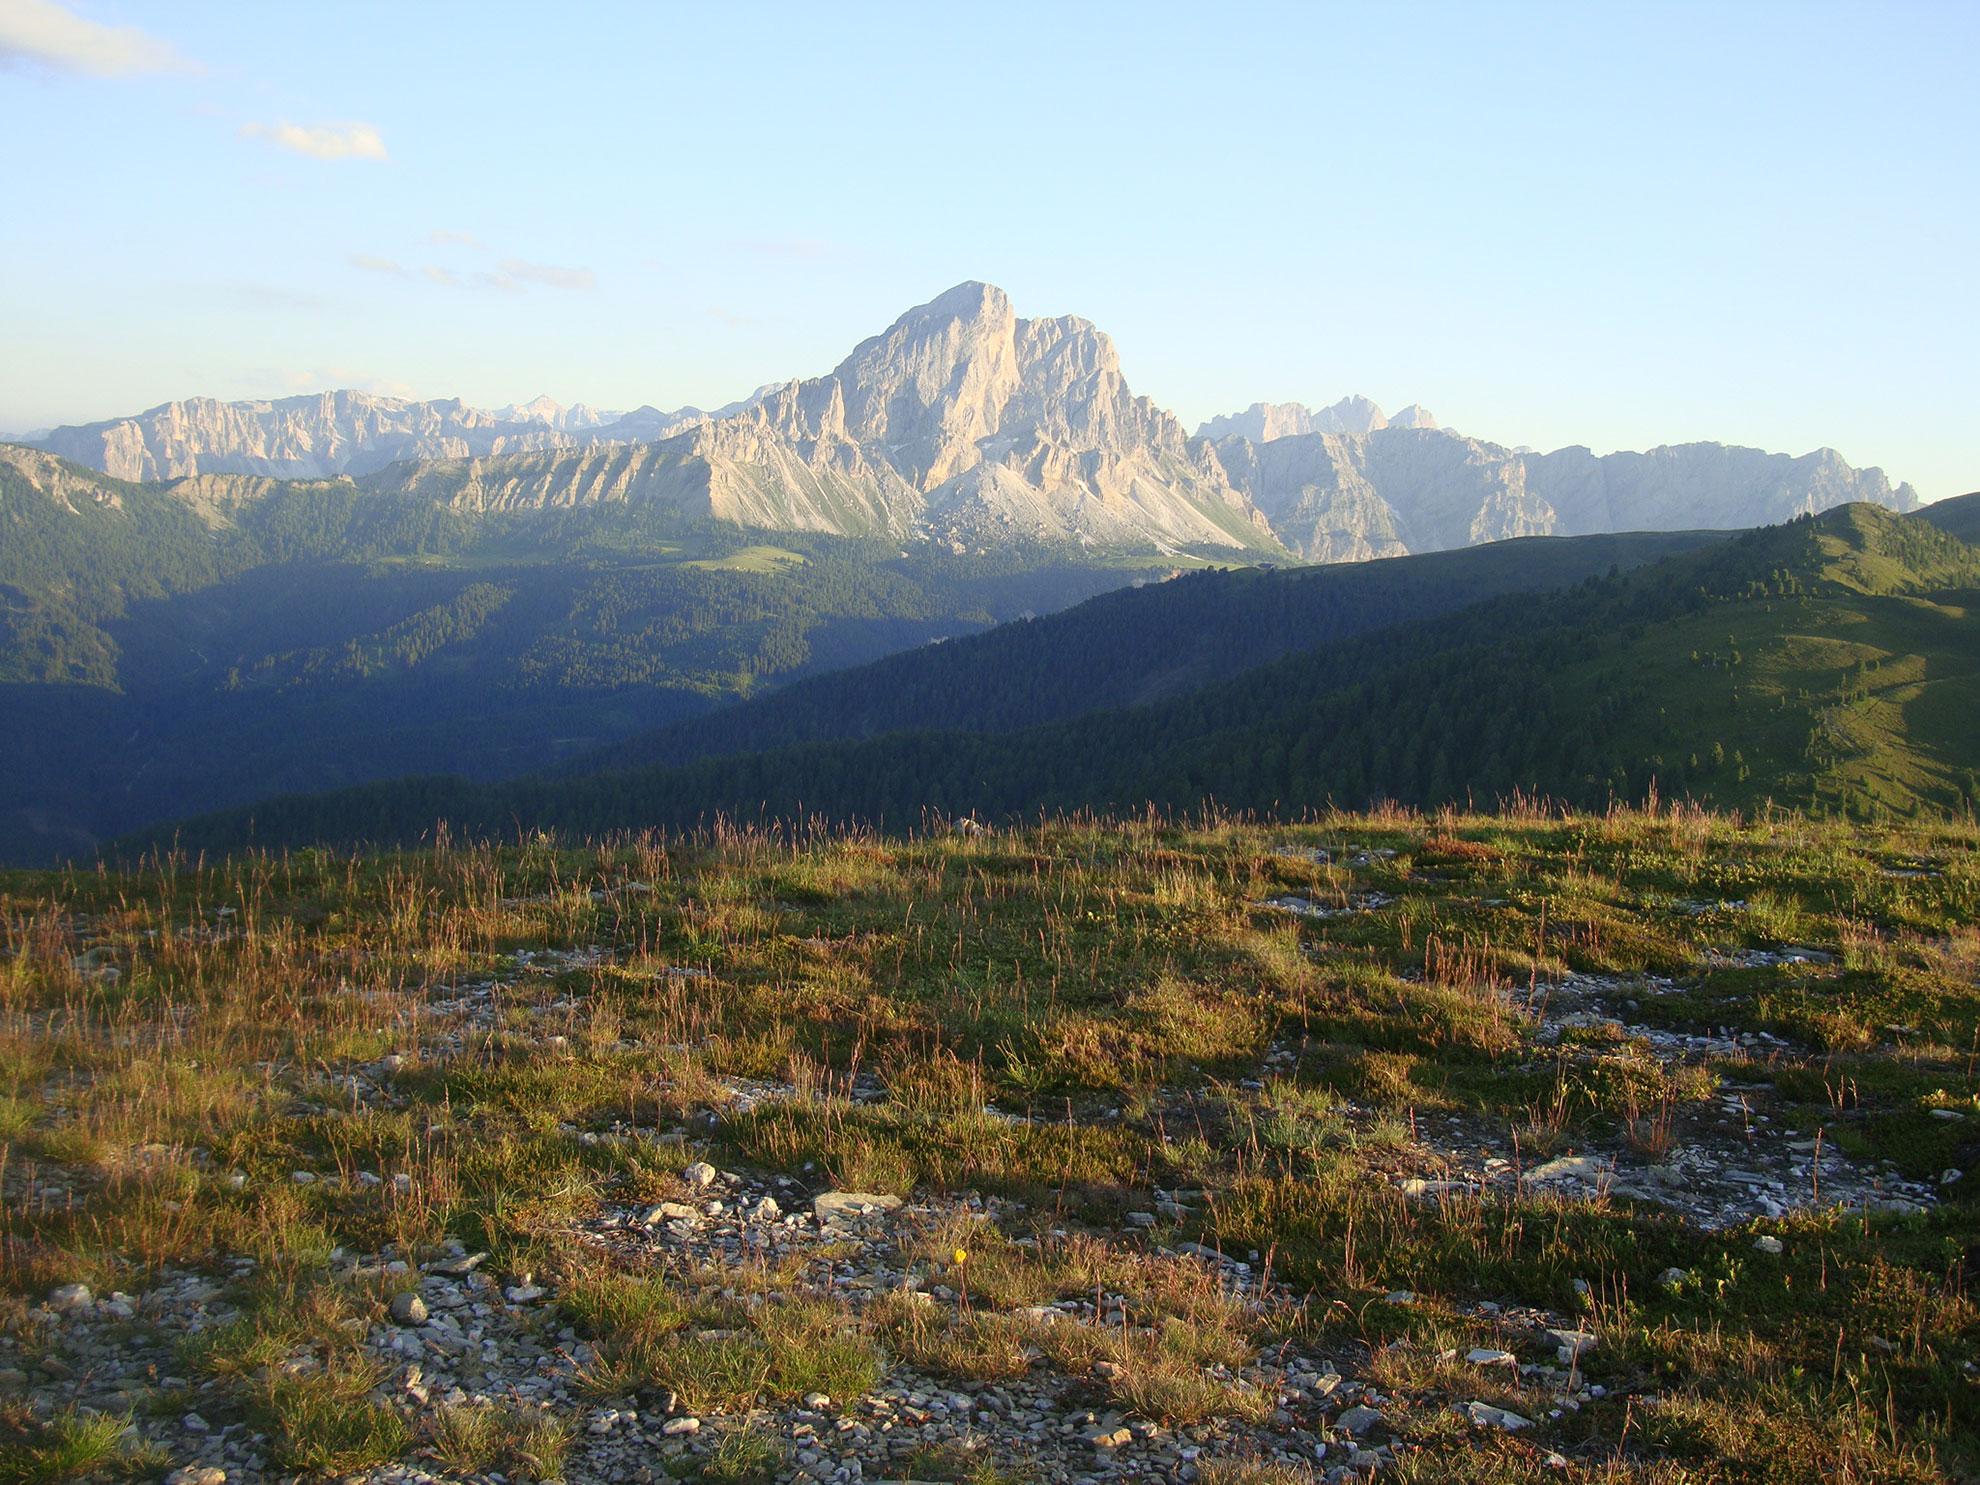 Hiking Getaway Trip South Tyrol Dolomite Mountains